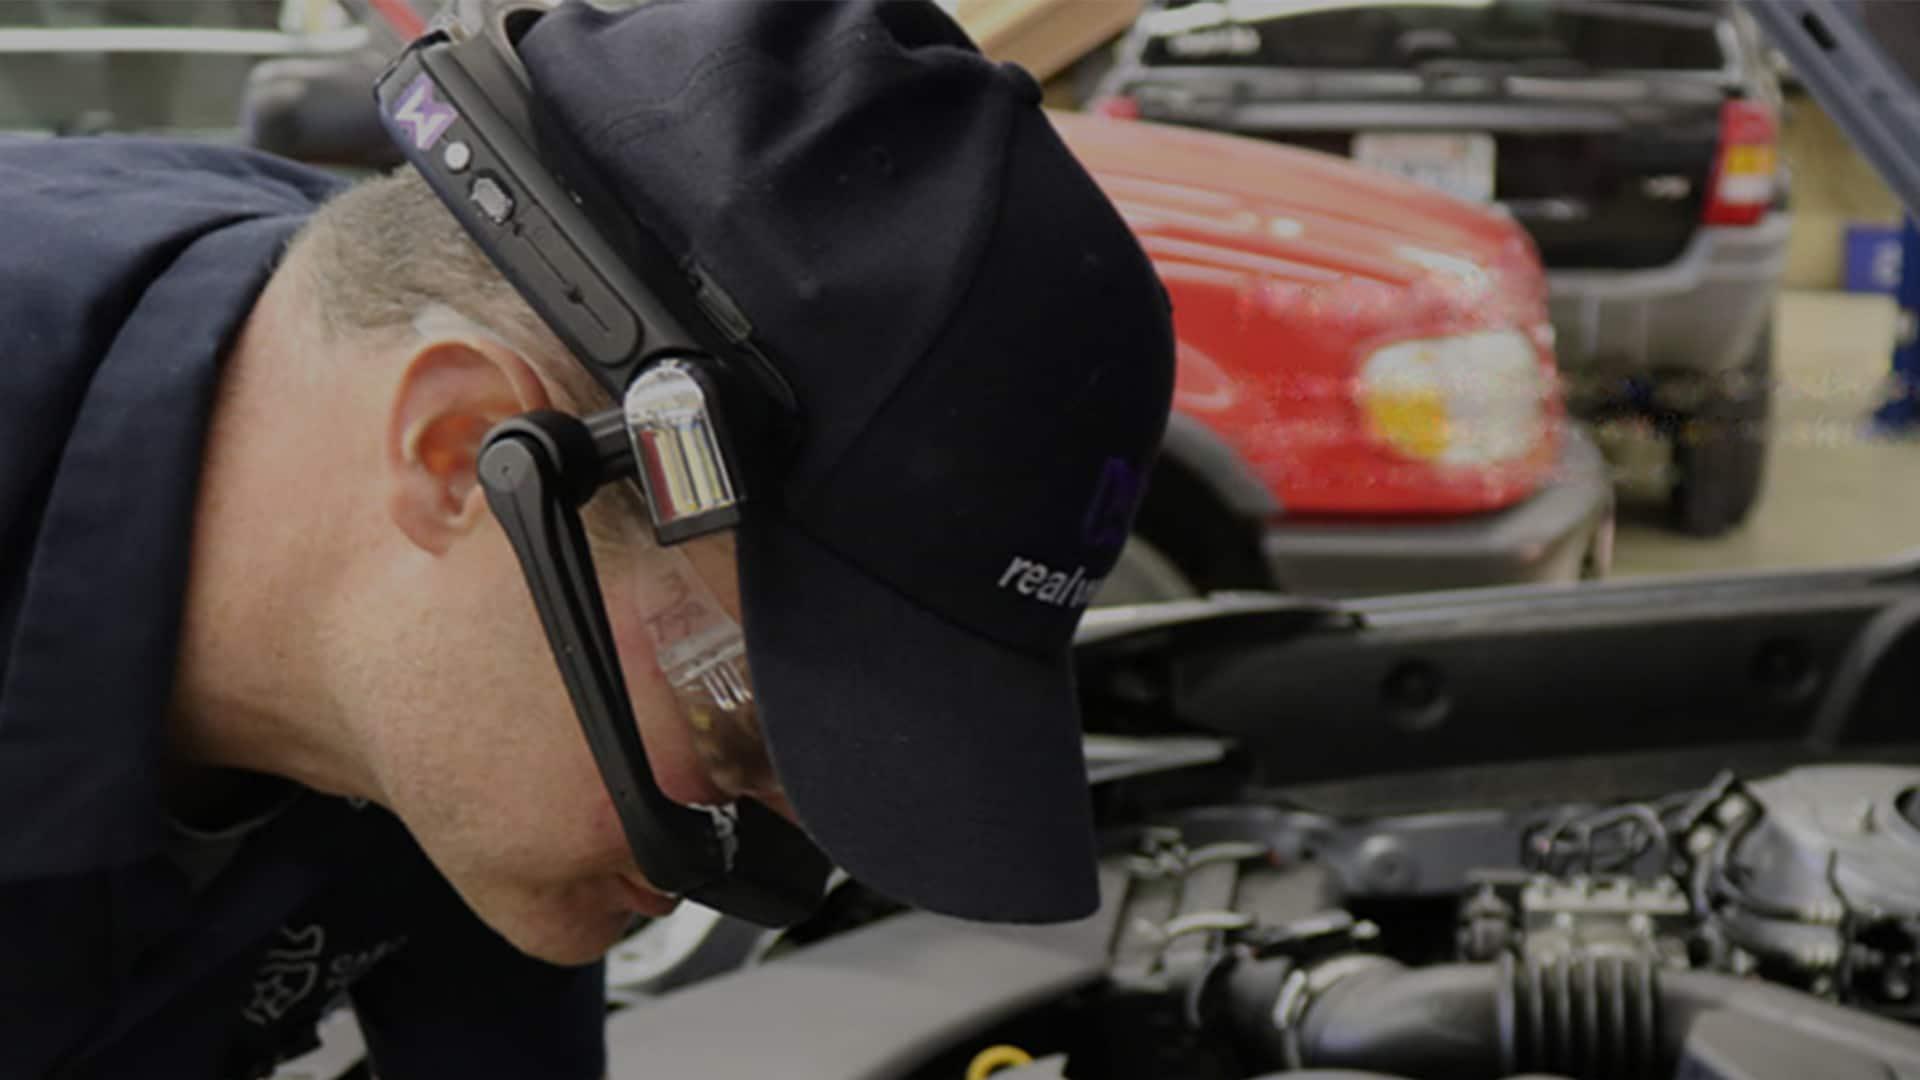 RealWear-HMT-1-AR-Helmet-Helping-Car-Companies-1